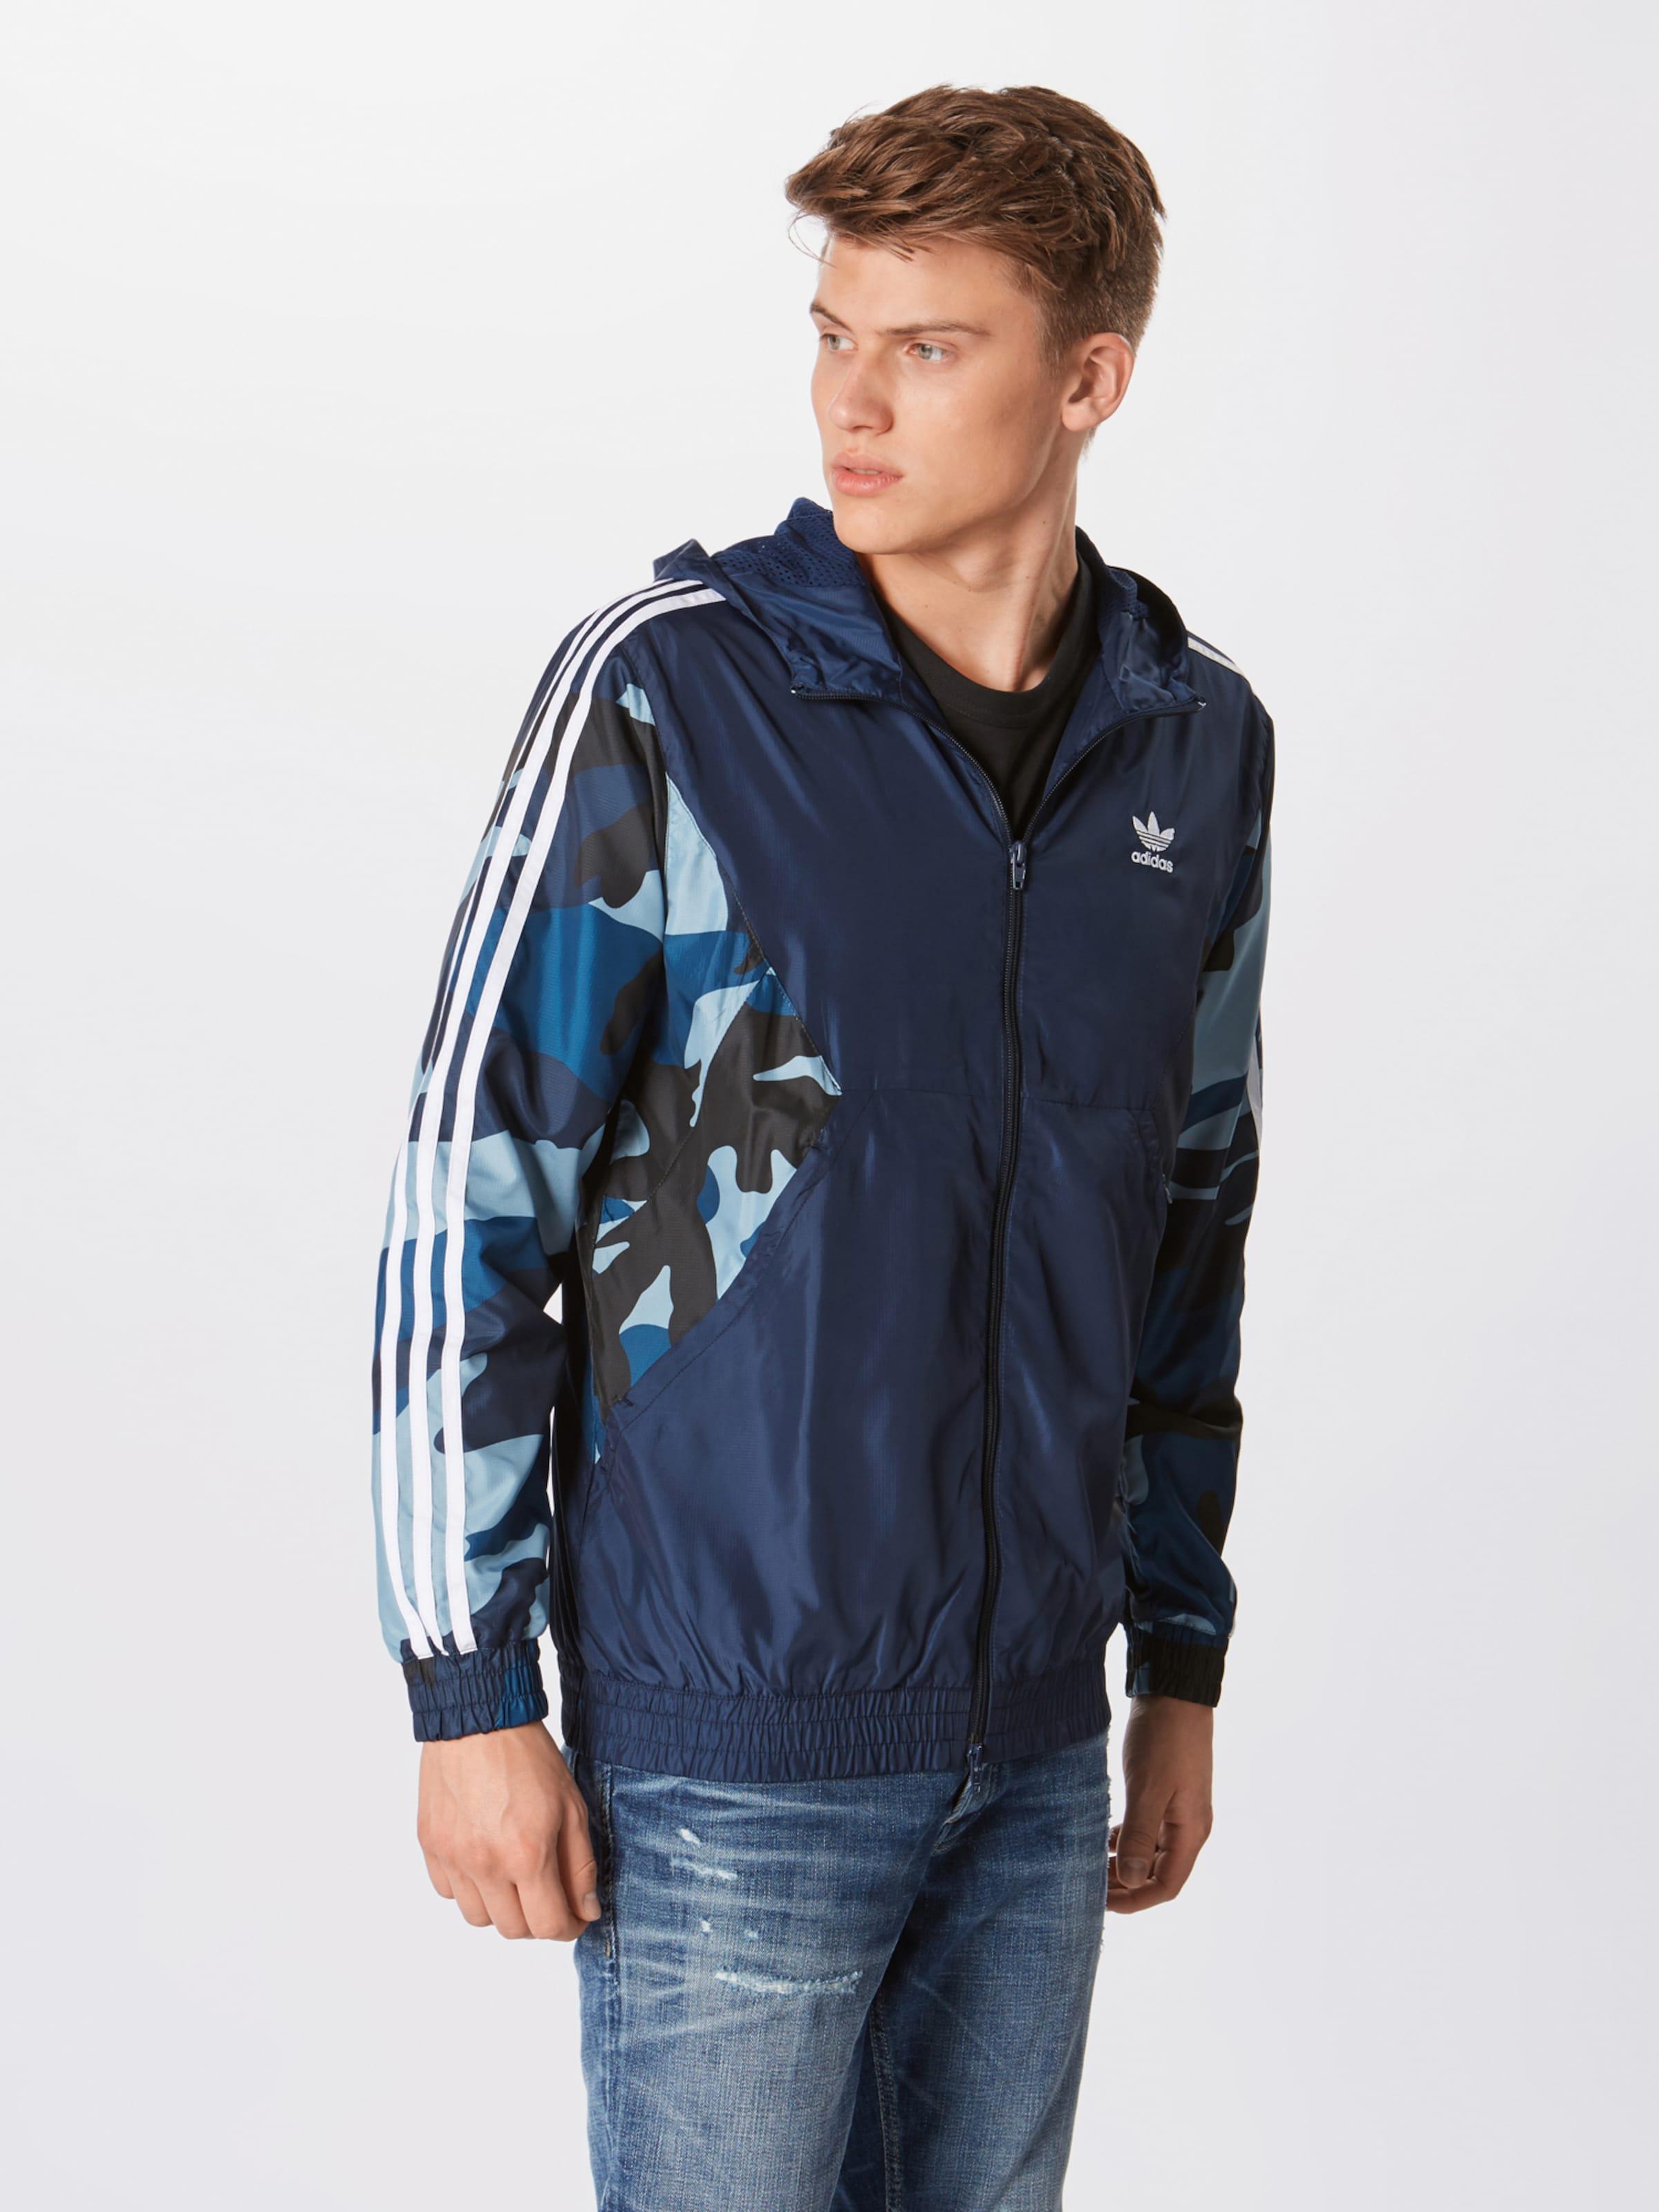 Marine Adidas saison 'camo Mi Bleu Originals En Veste Wb' 8wm0vNn